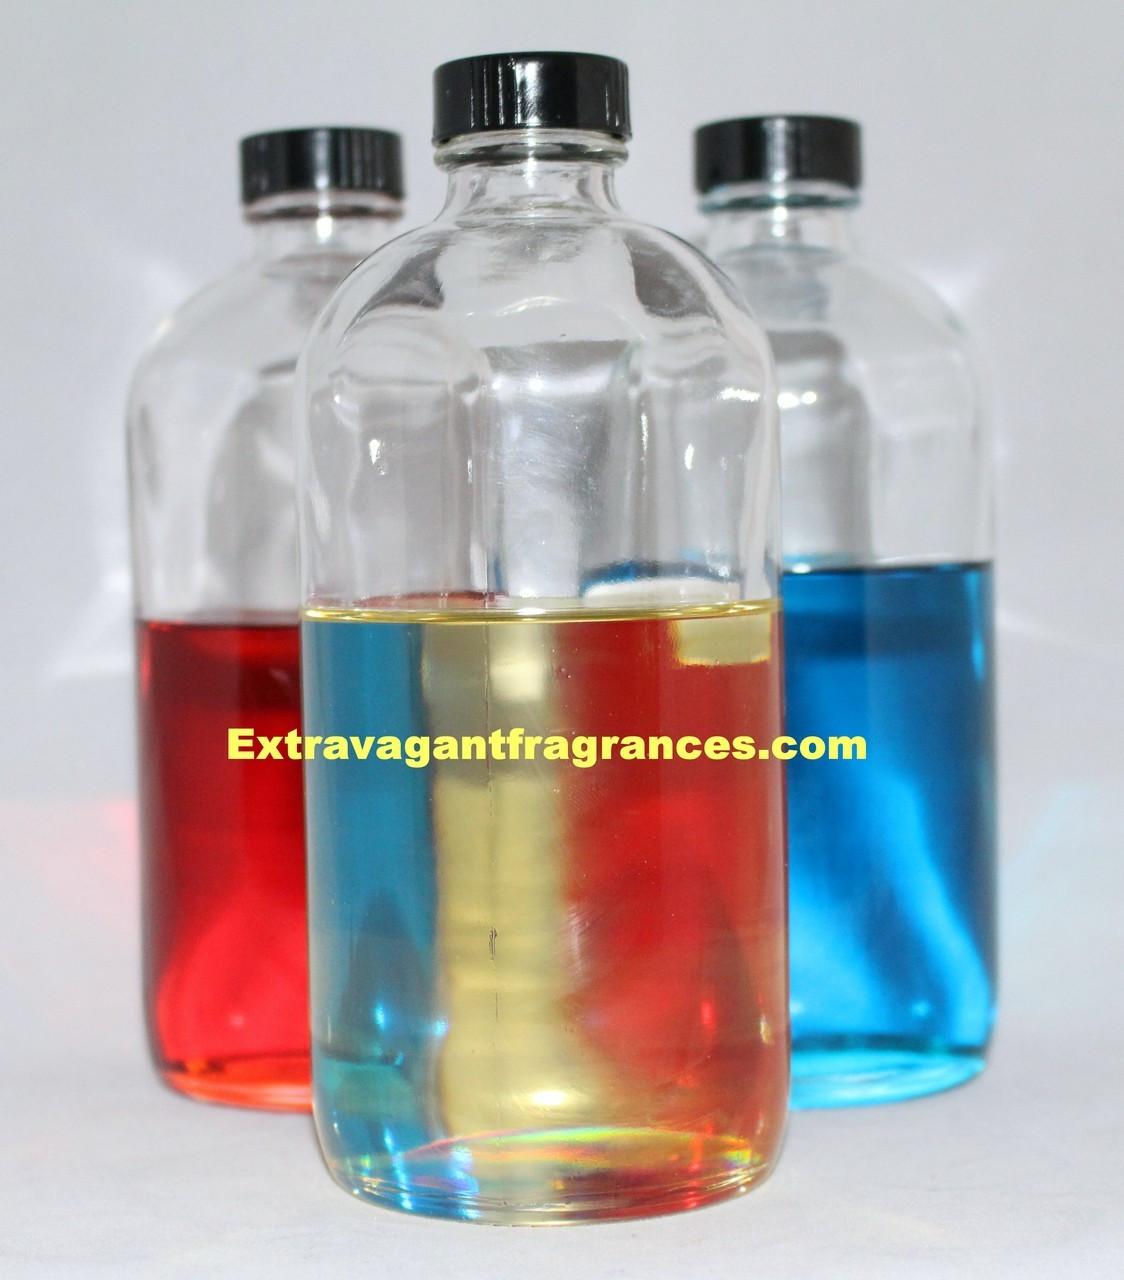 Wholesale Body Oils Extravagantfragrances